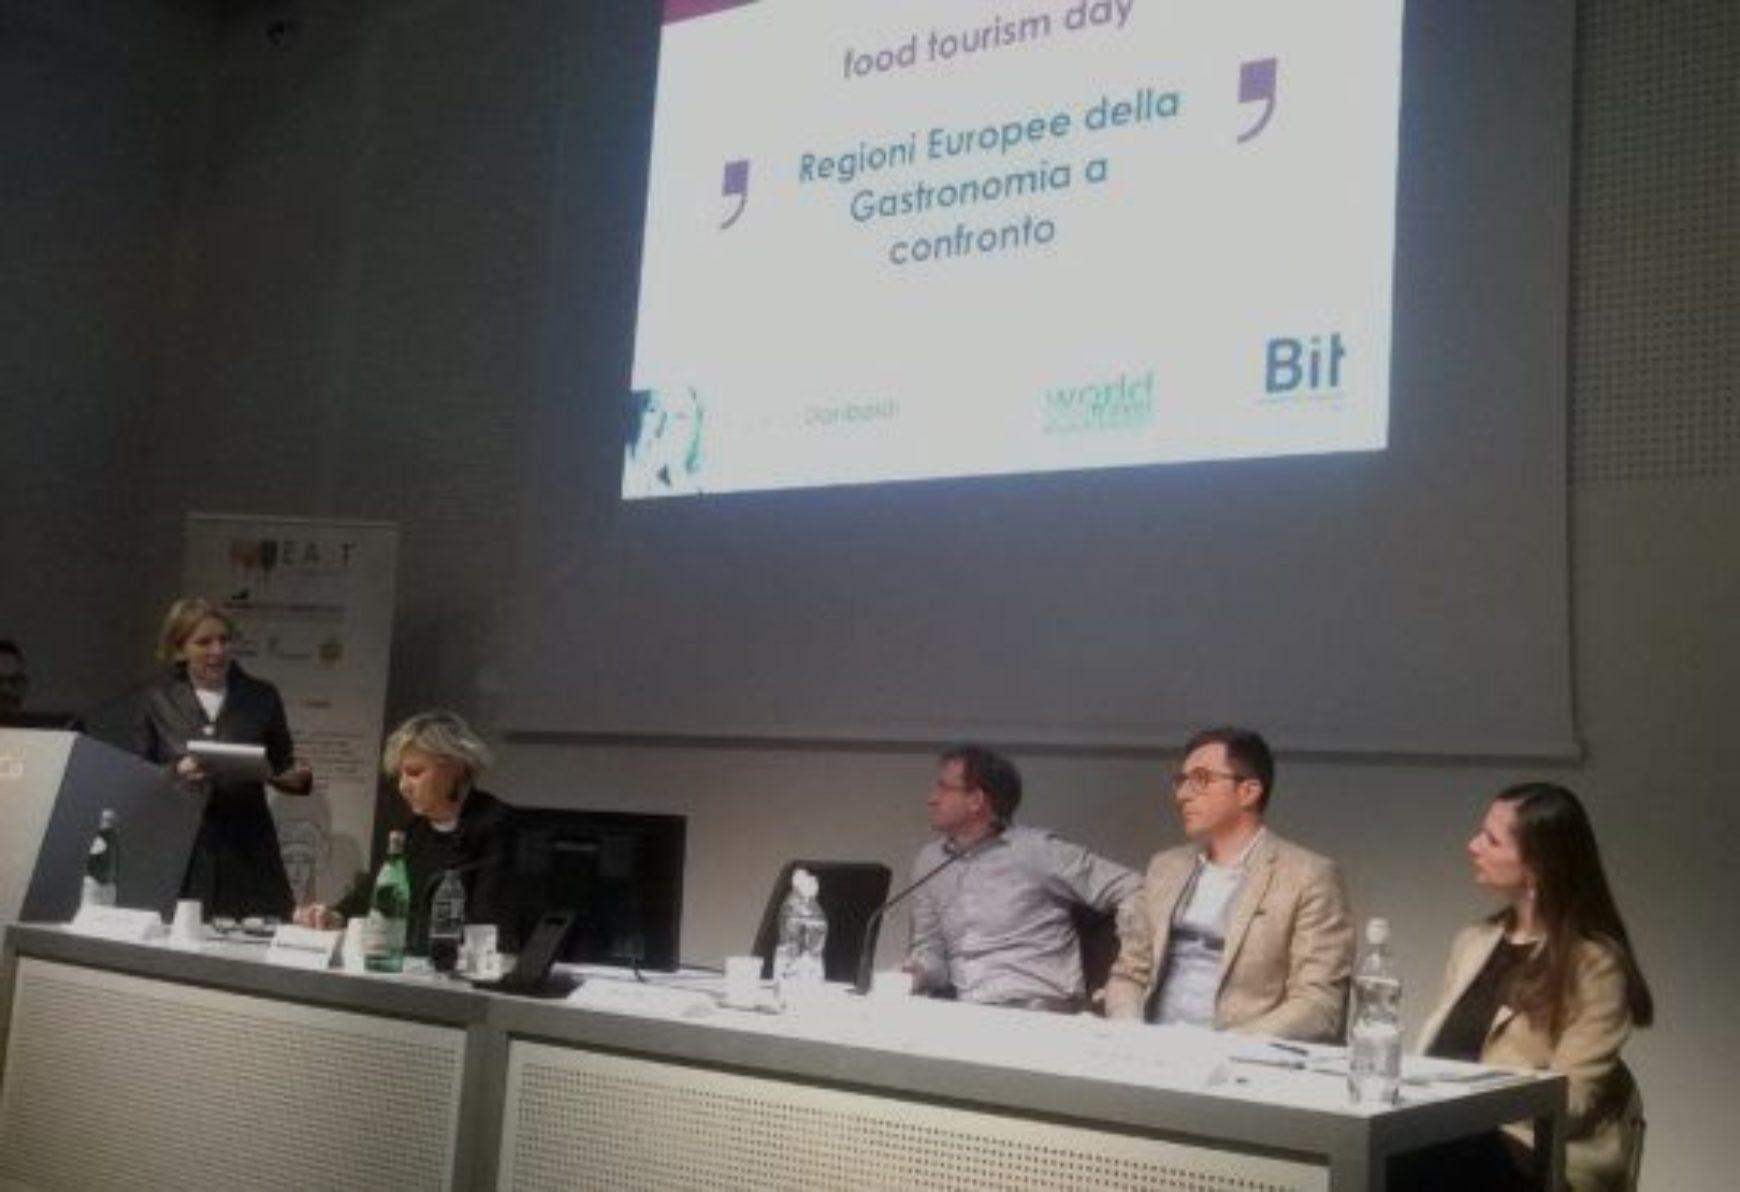 Bit 2018: A comparison among European Regions of Gastronomy